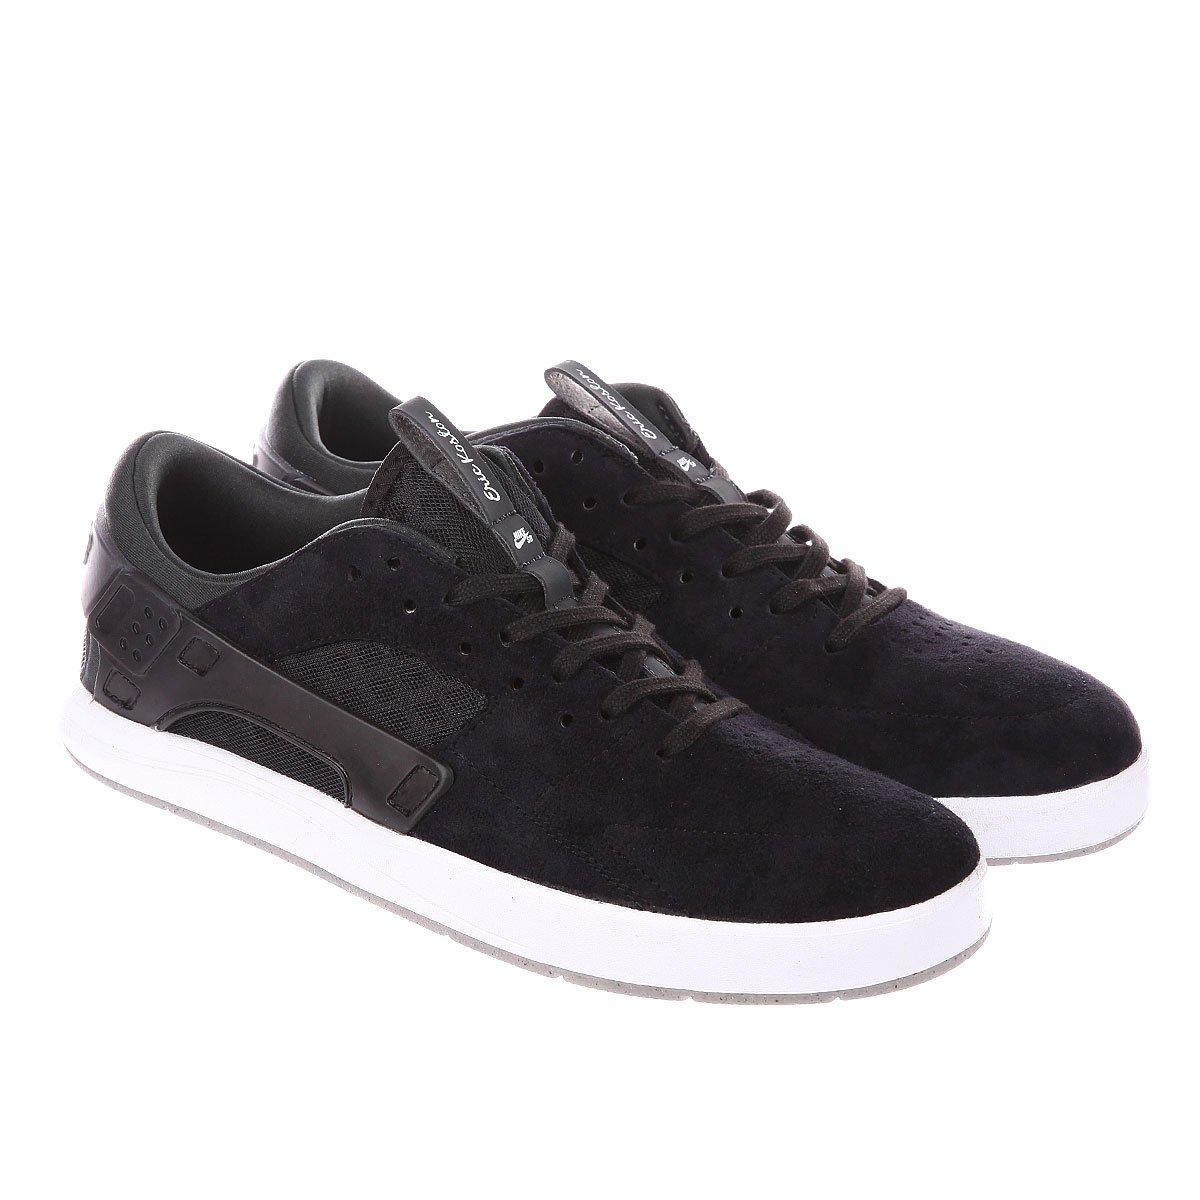 6f806f84 Купить кеды Nike Eric Koston Huarache Black/Anthracite/White (705192 ...